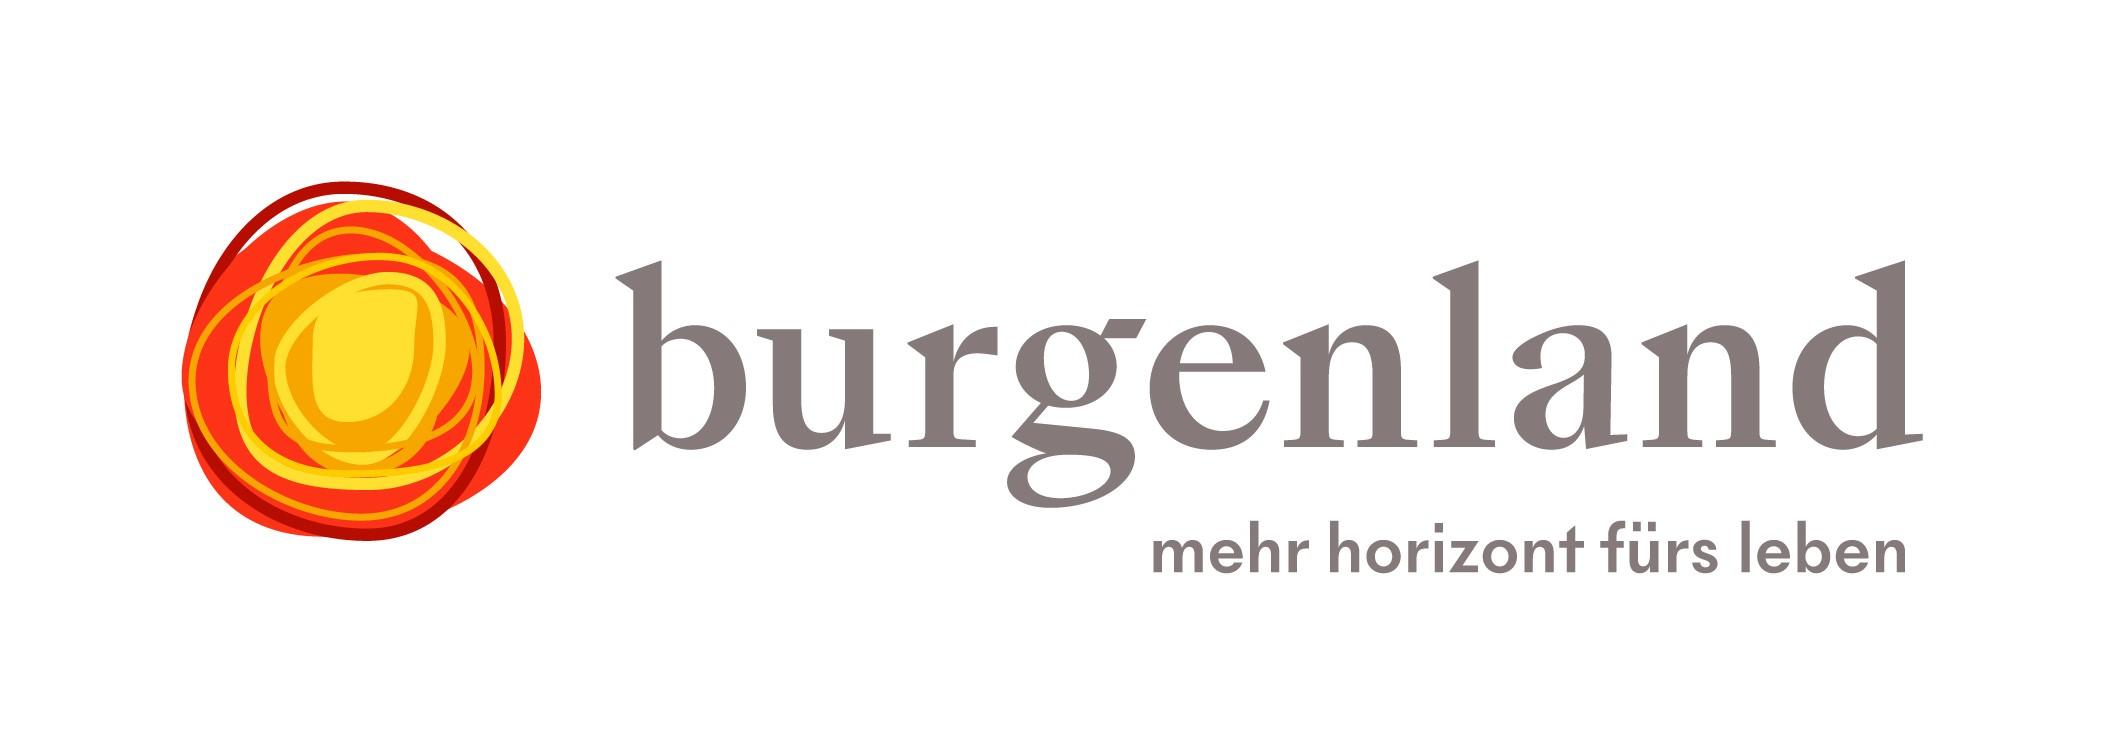 Burgenland Logo